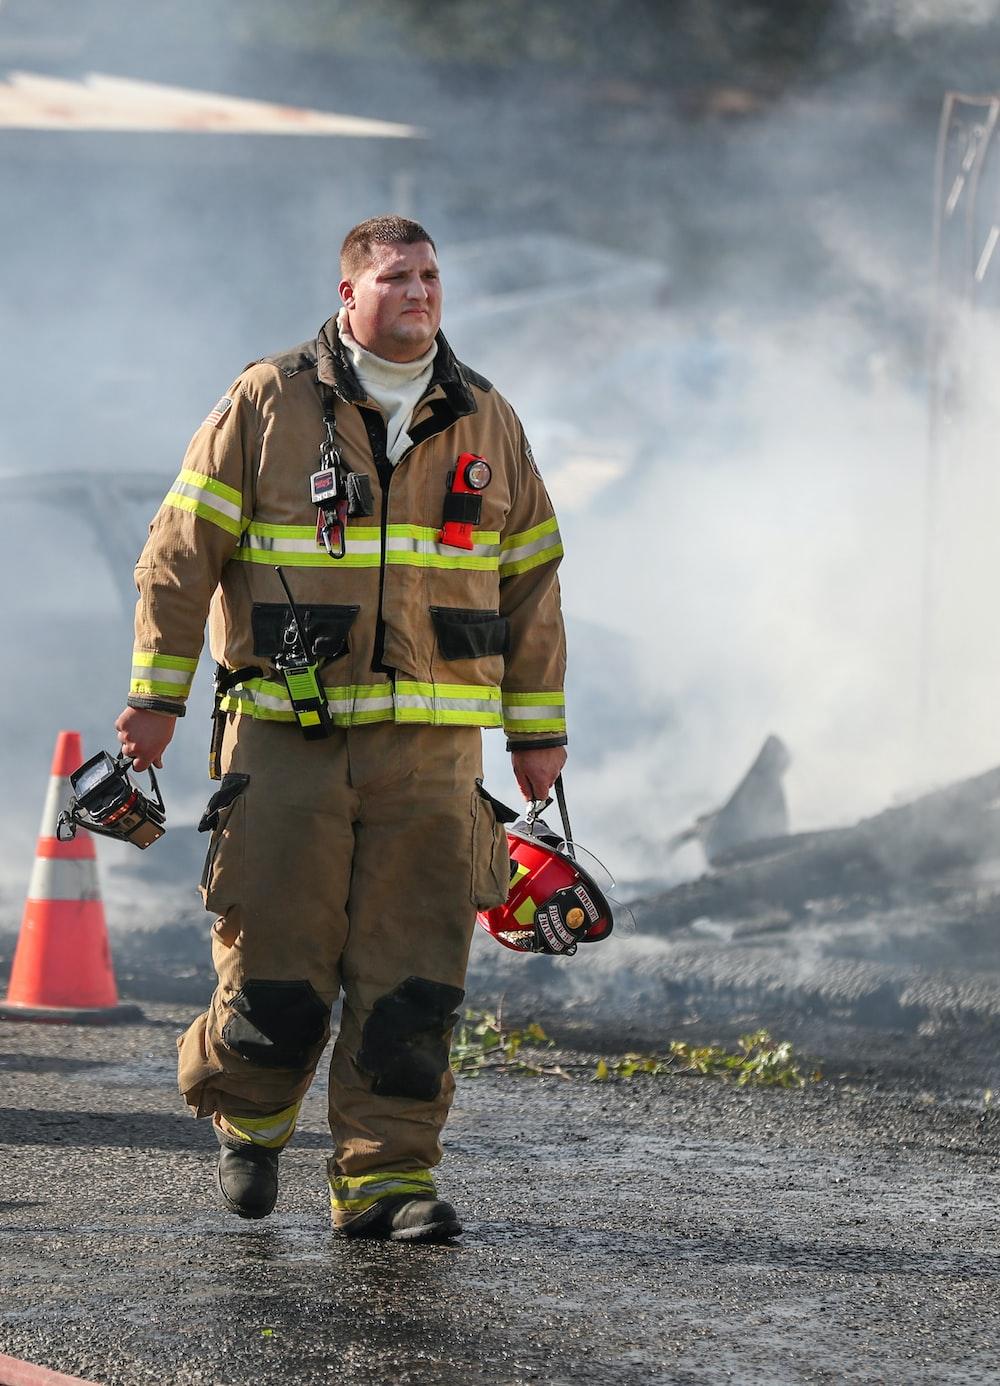 fireman holding helmet standing on road